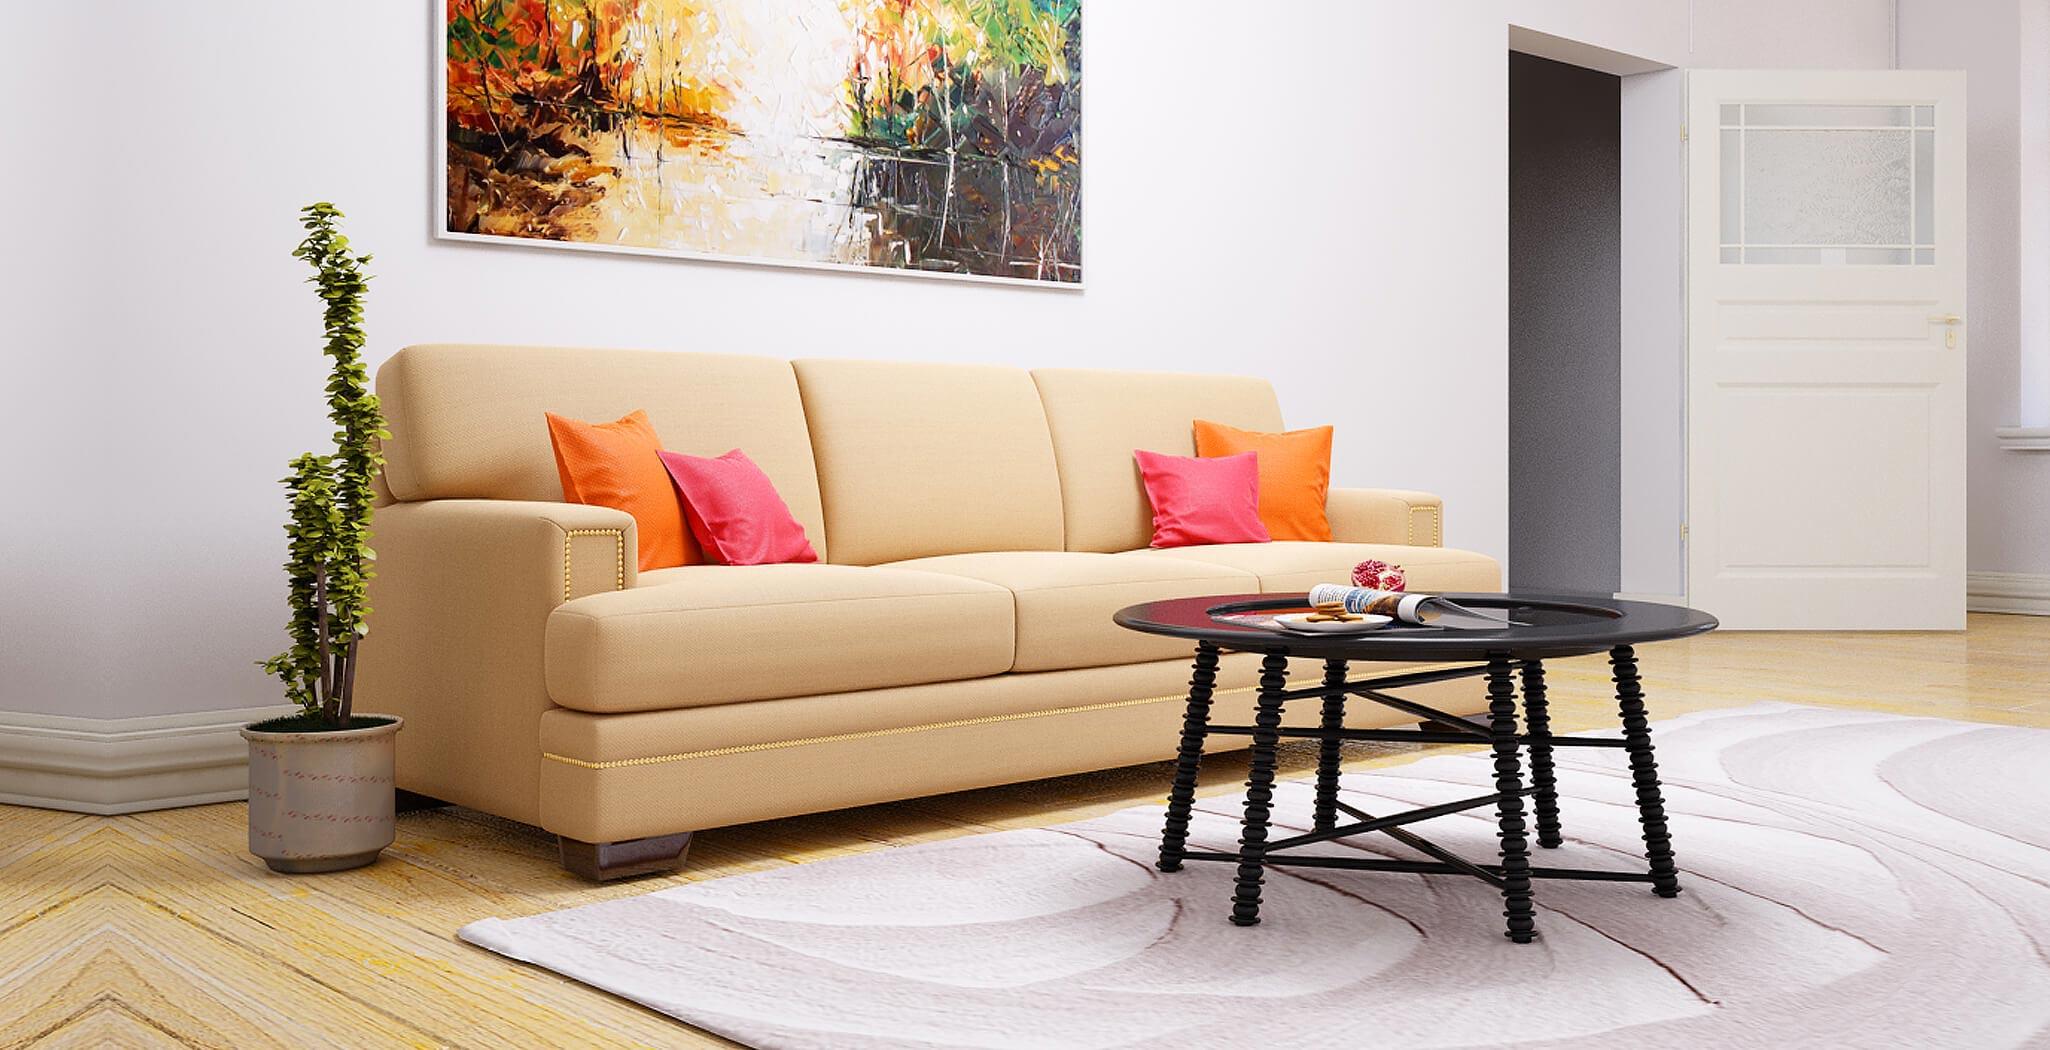 barcelona sofa furniture gallery 4